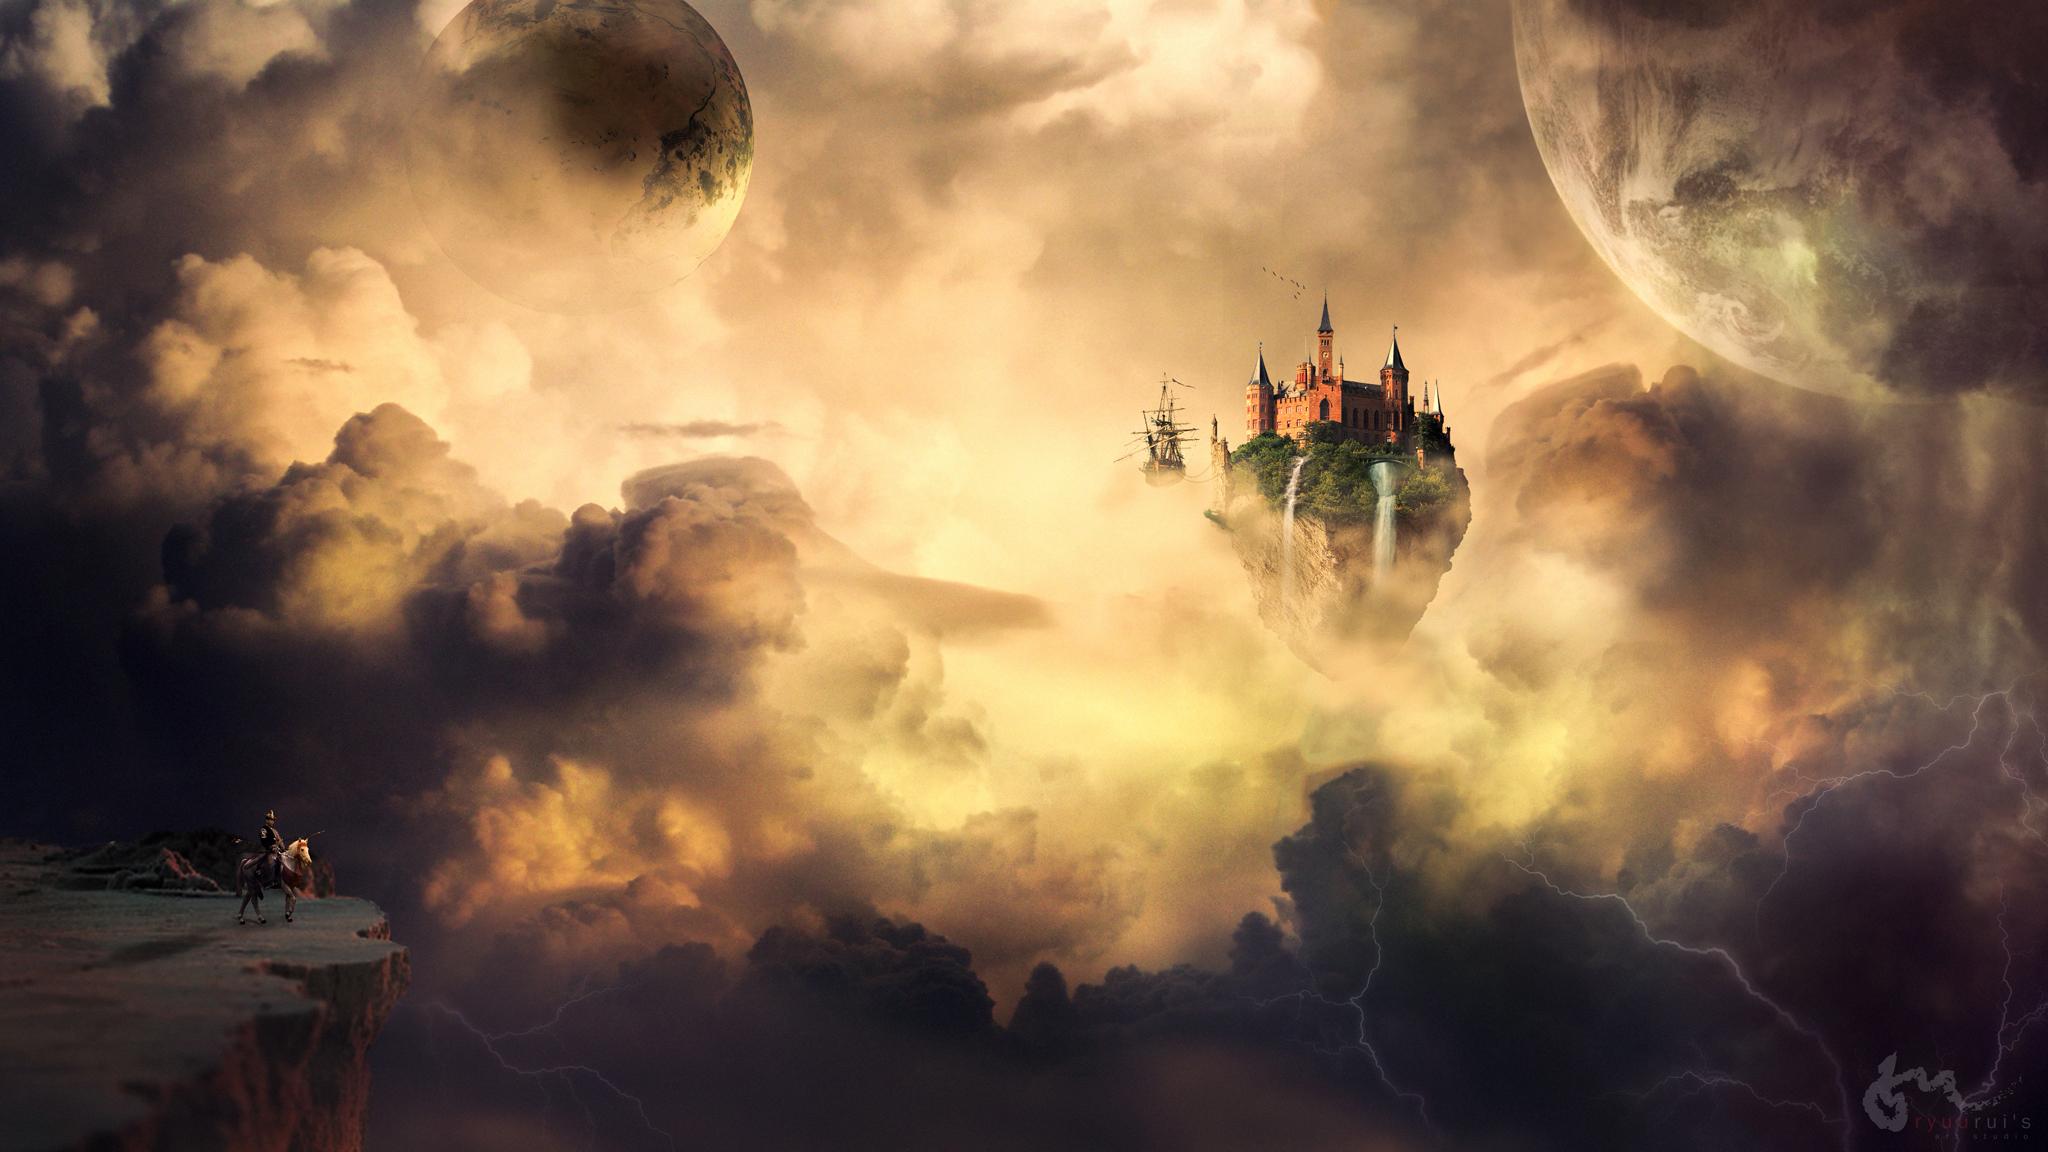 Cloud castle - fantasy landscape by PonteRyuurui on DeviantArt